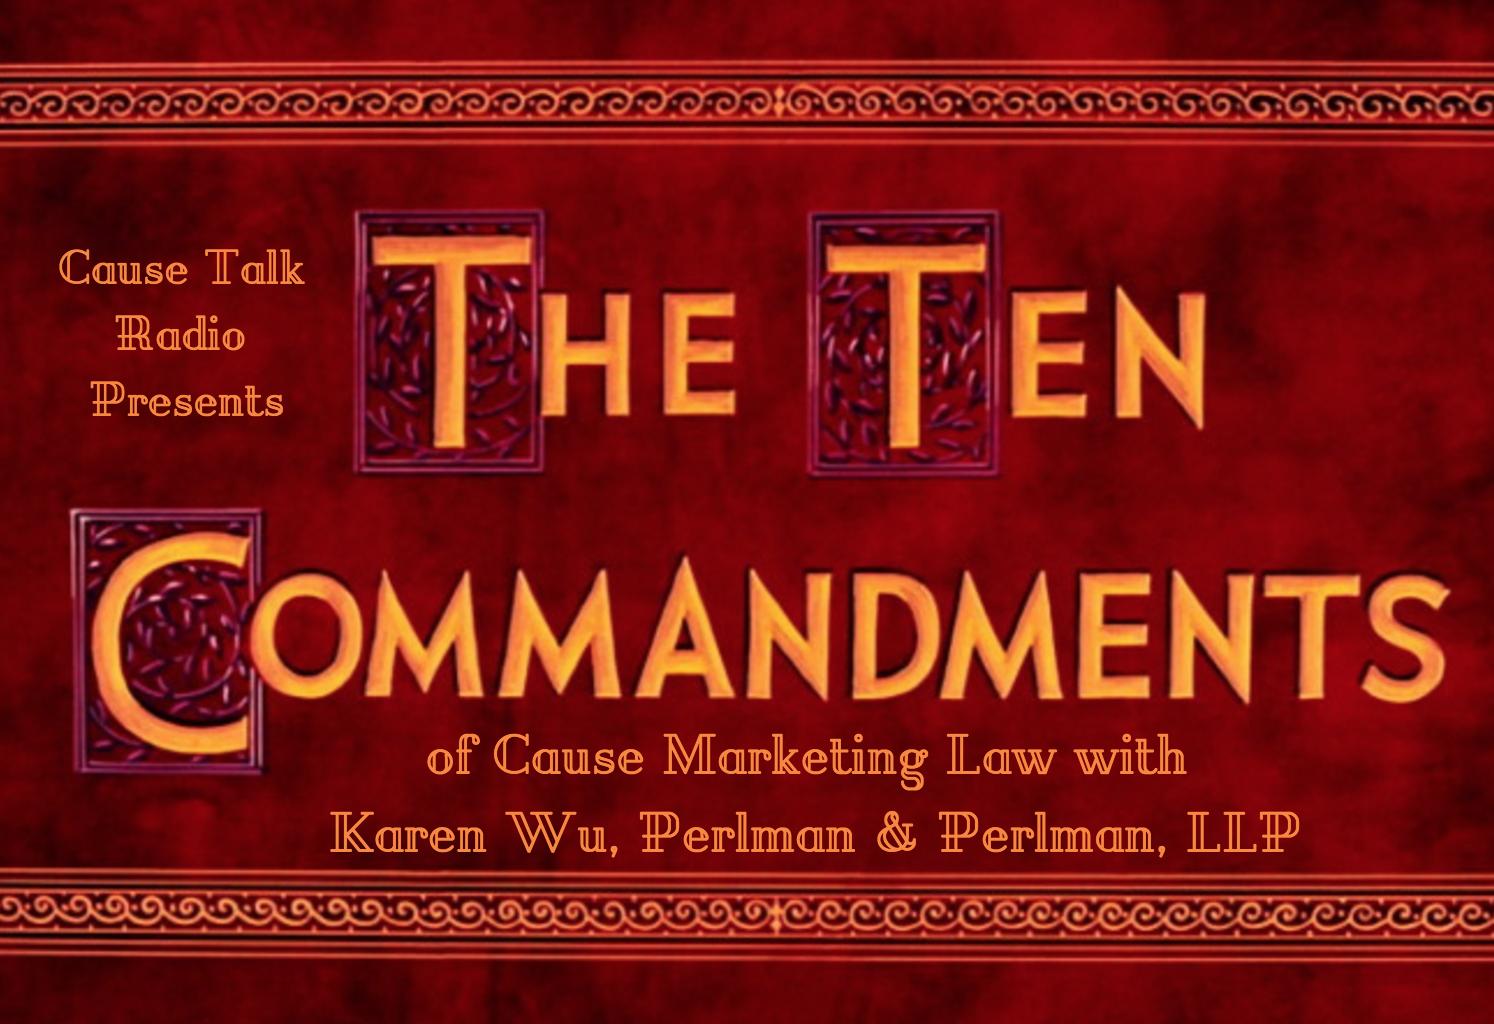 Ten Commandments of Cause Marketing Law